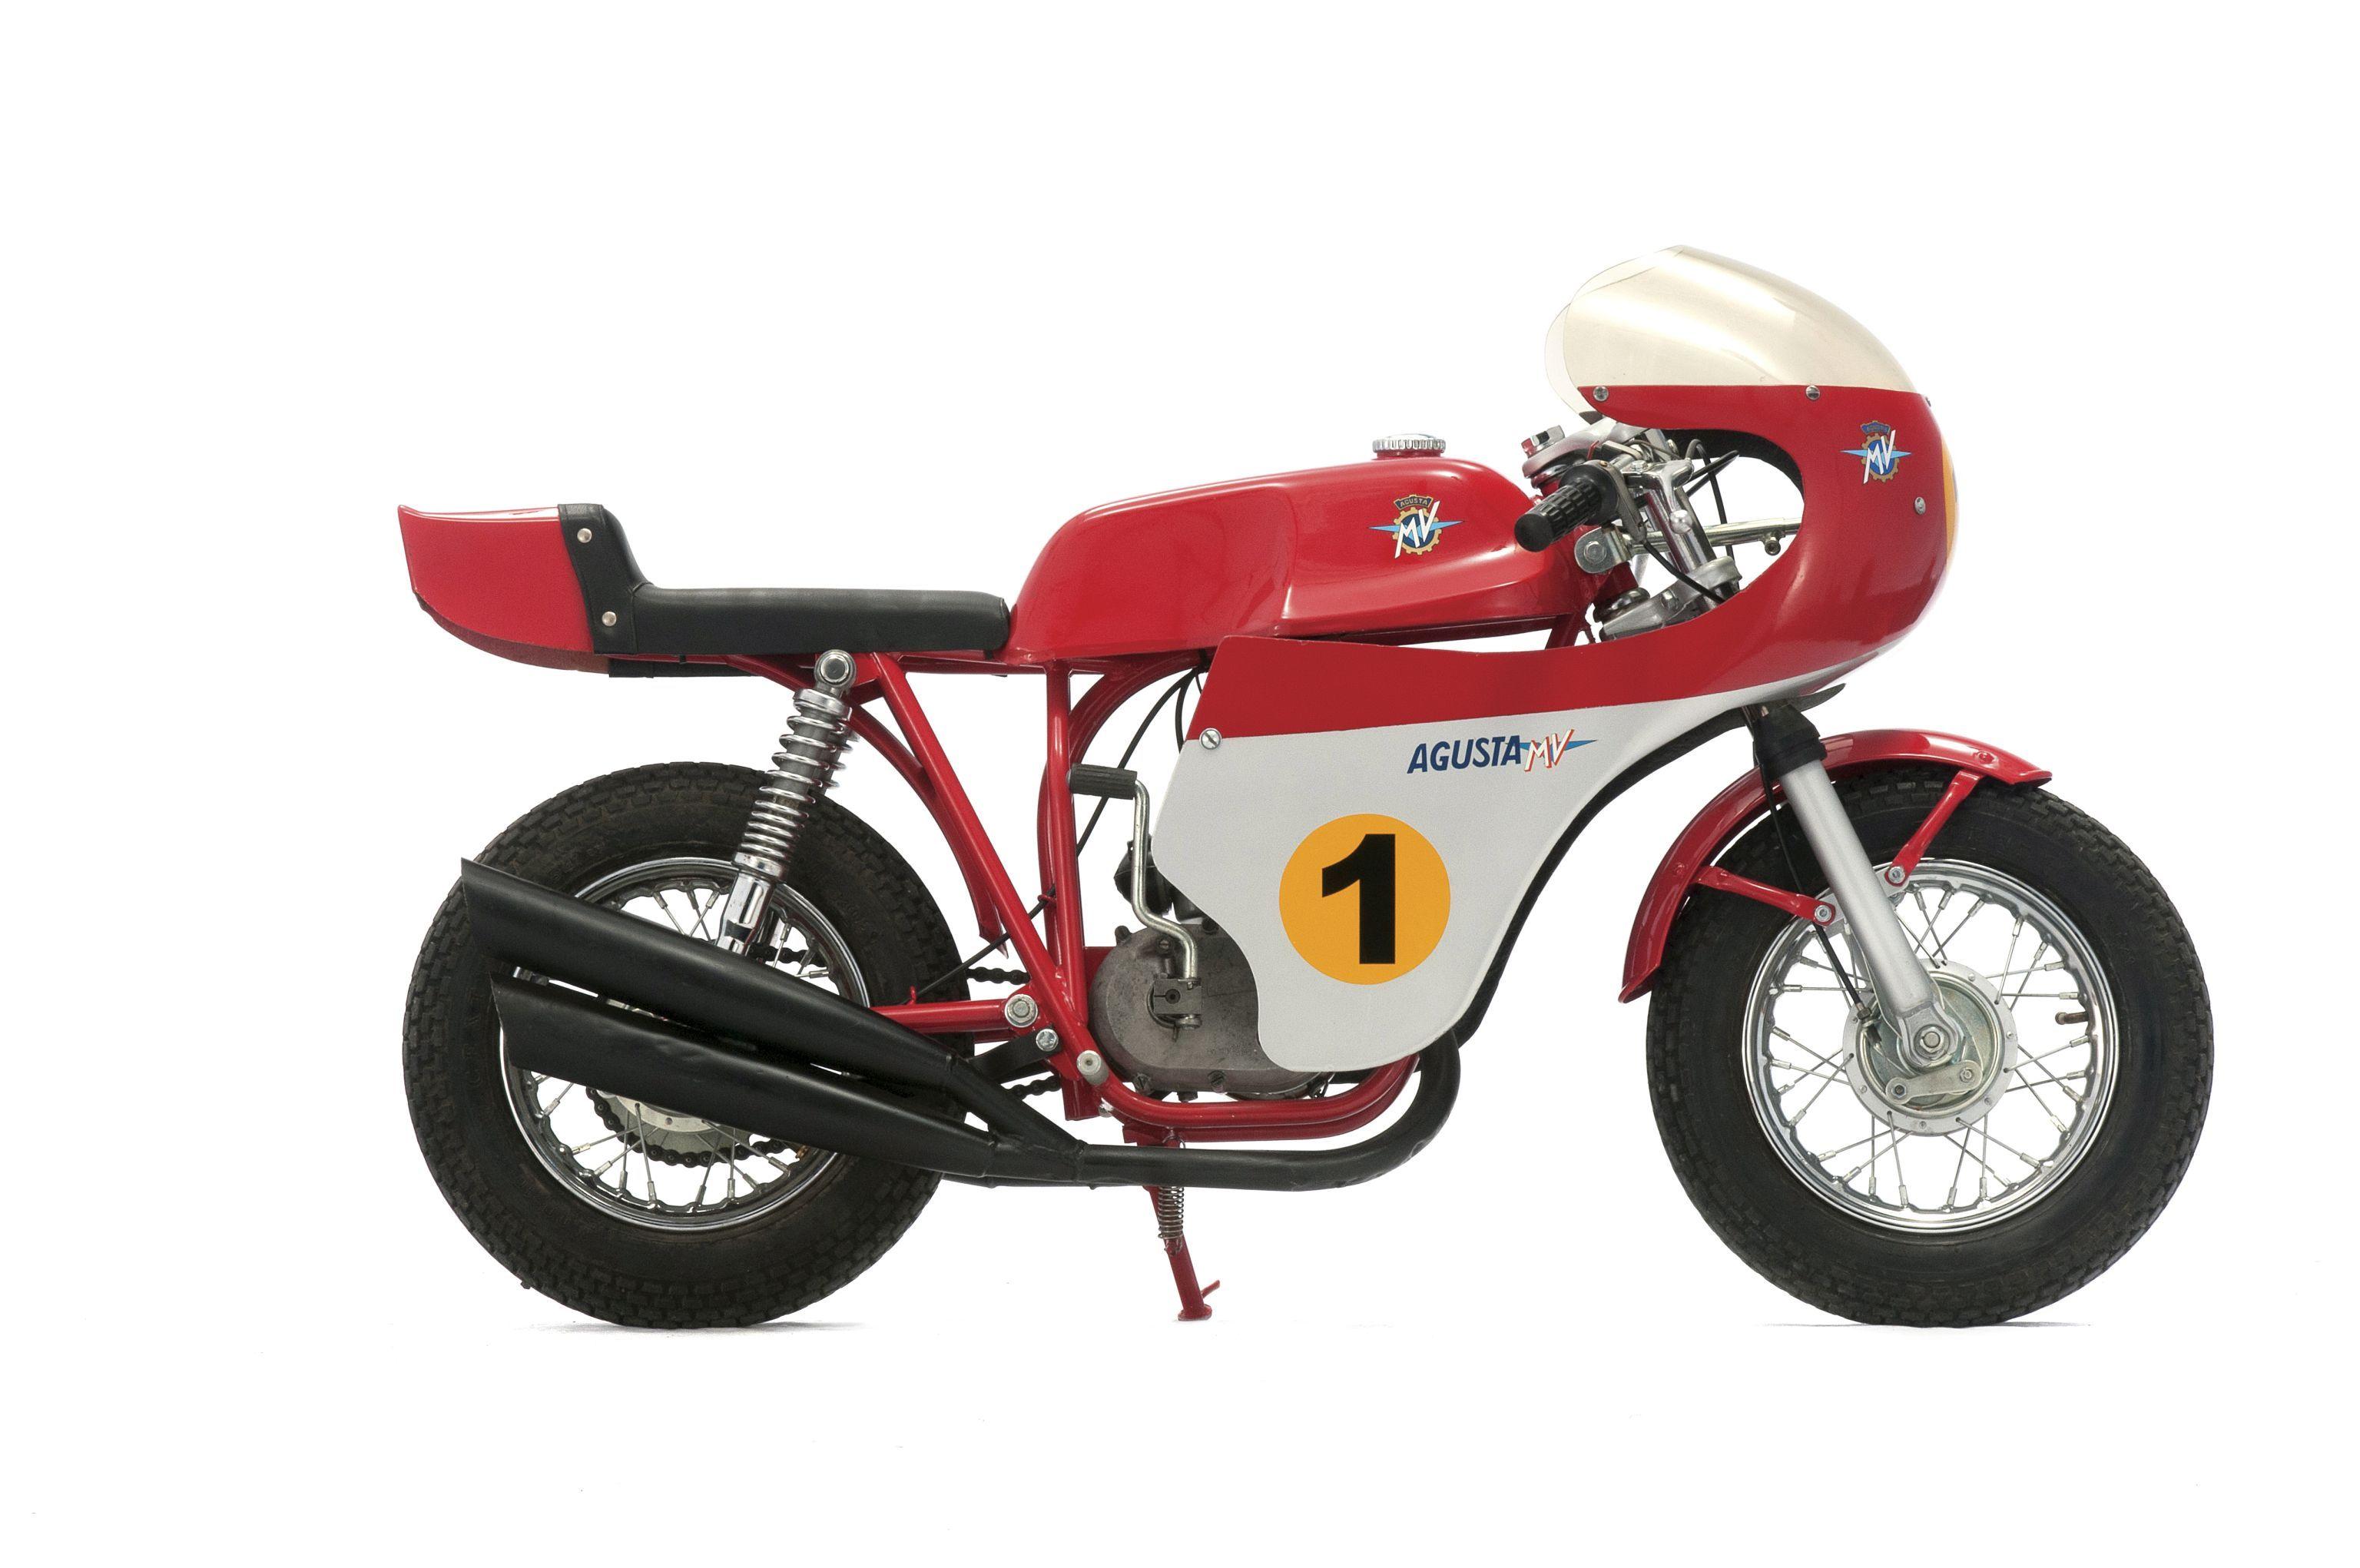 1973 Mv Agusta Phil Read Inspired Minibike Classic Motorcycles Mini Bike Motorcycle